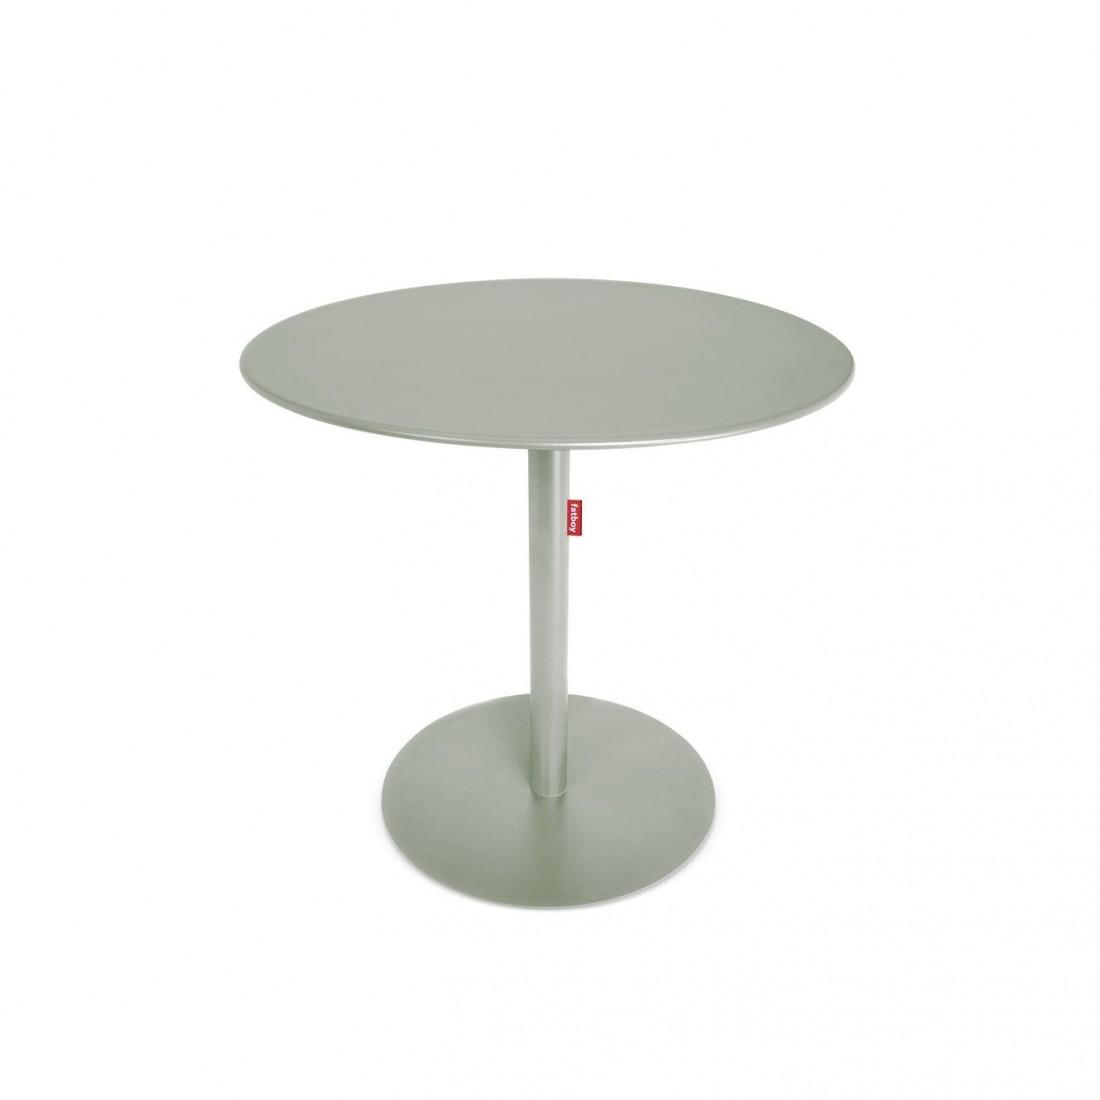 Table Formitable XS Outdoor Fatboy